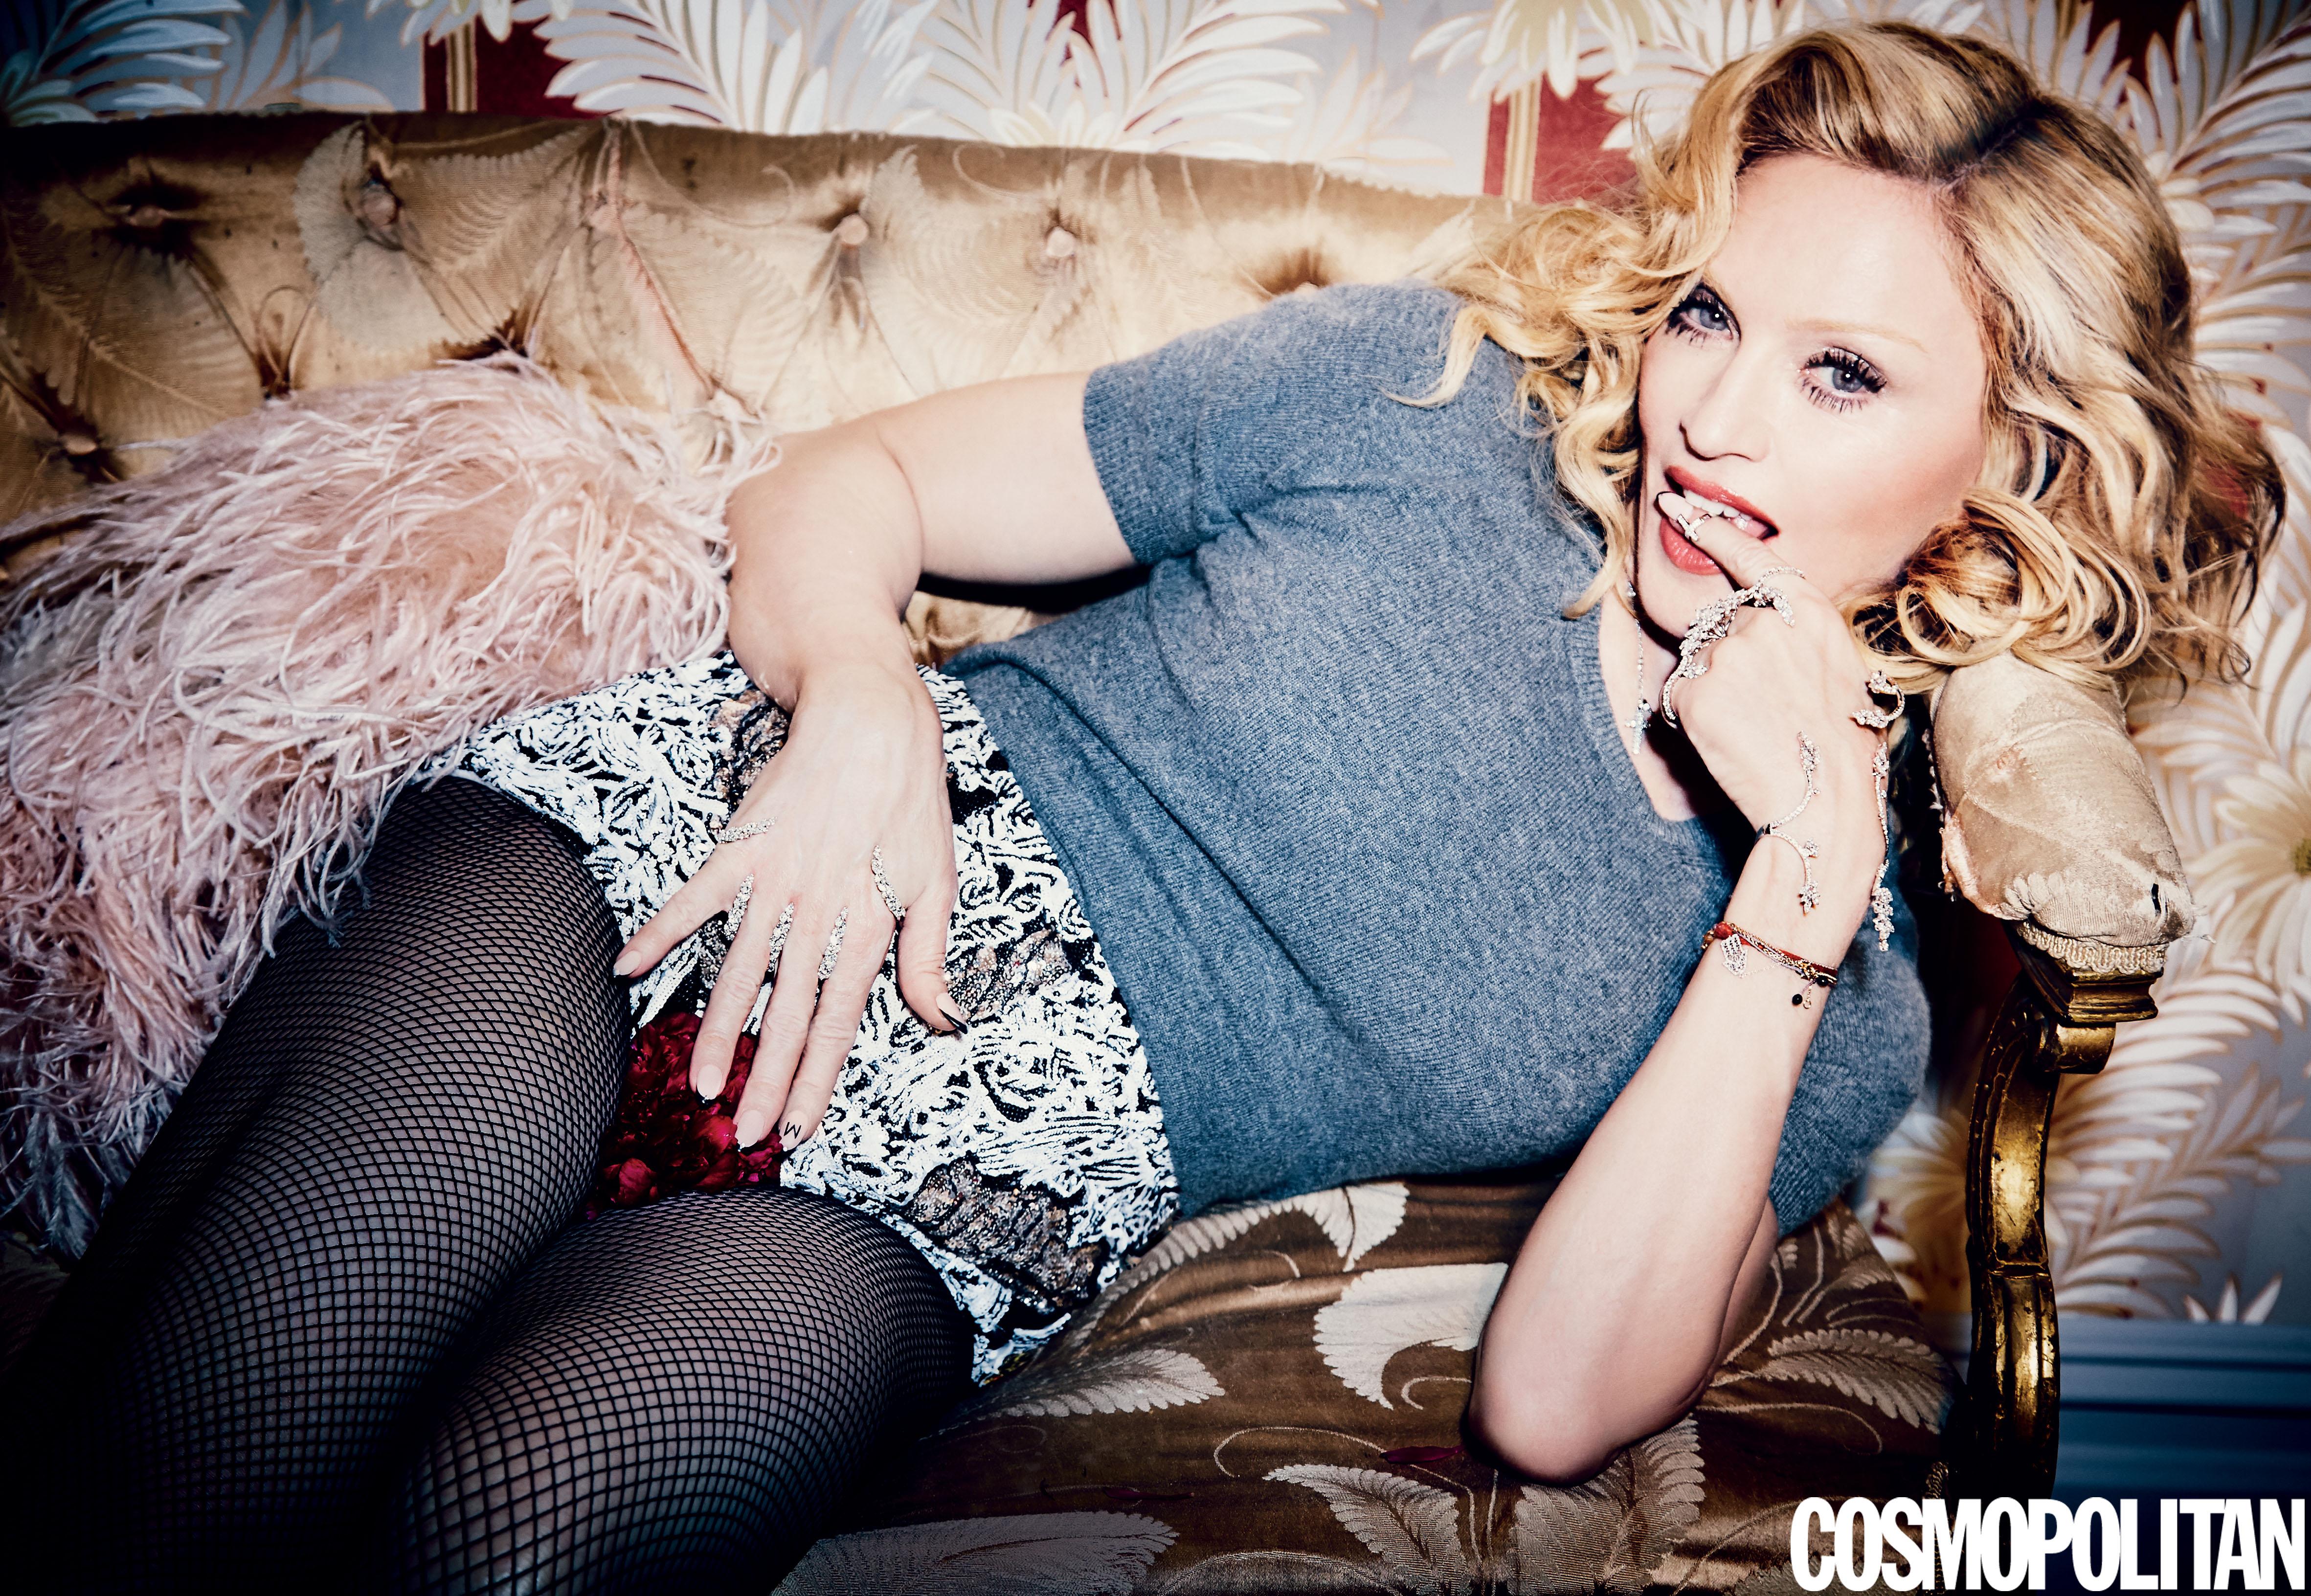 Cosmo-May-15-Madonna-2.jpg